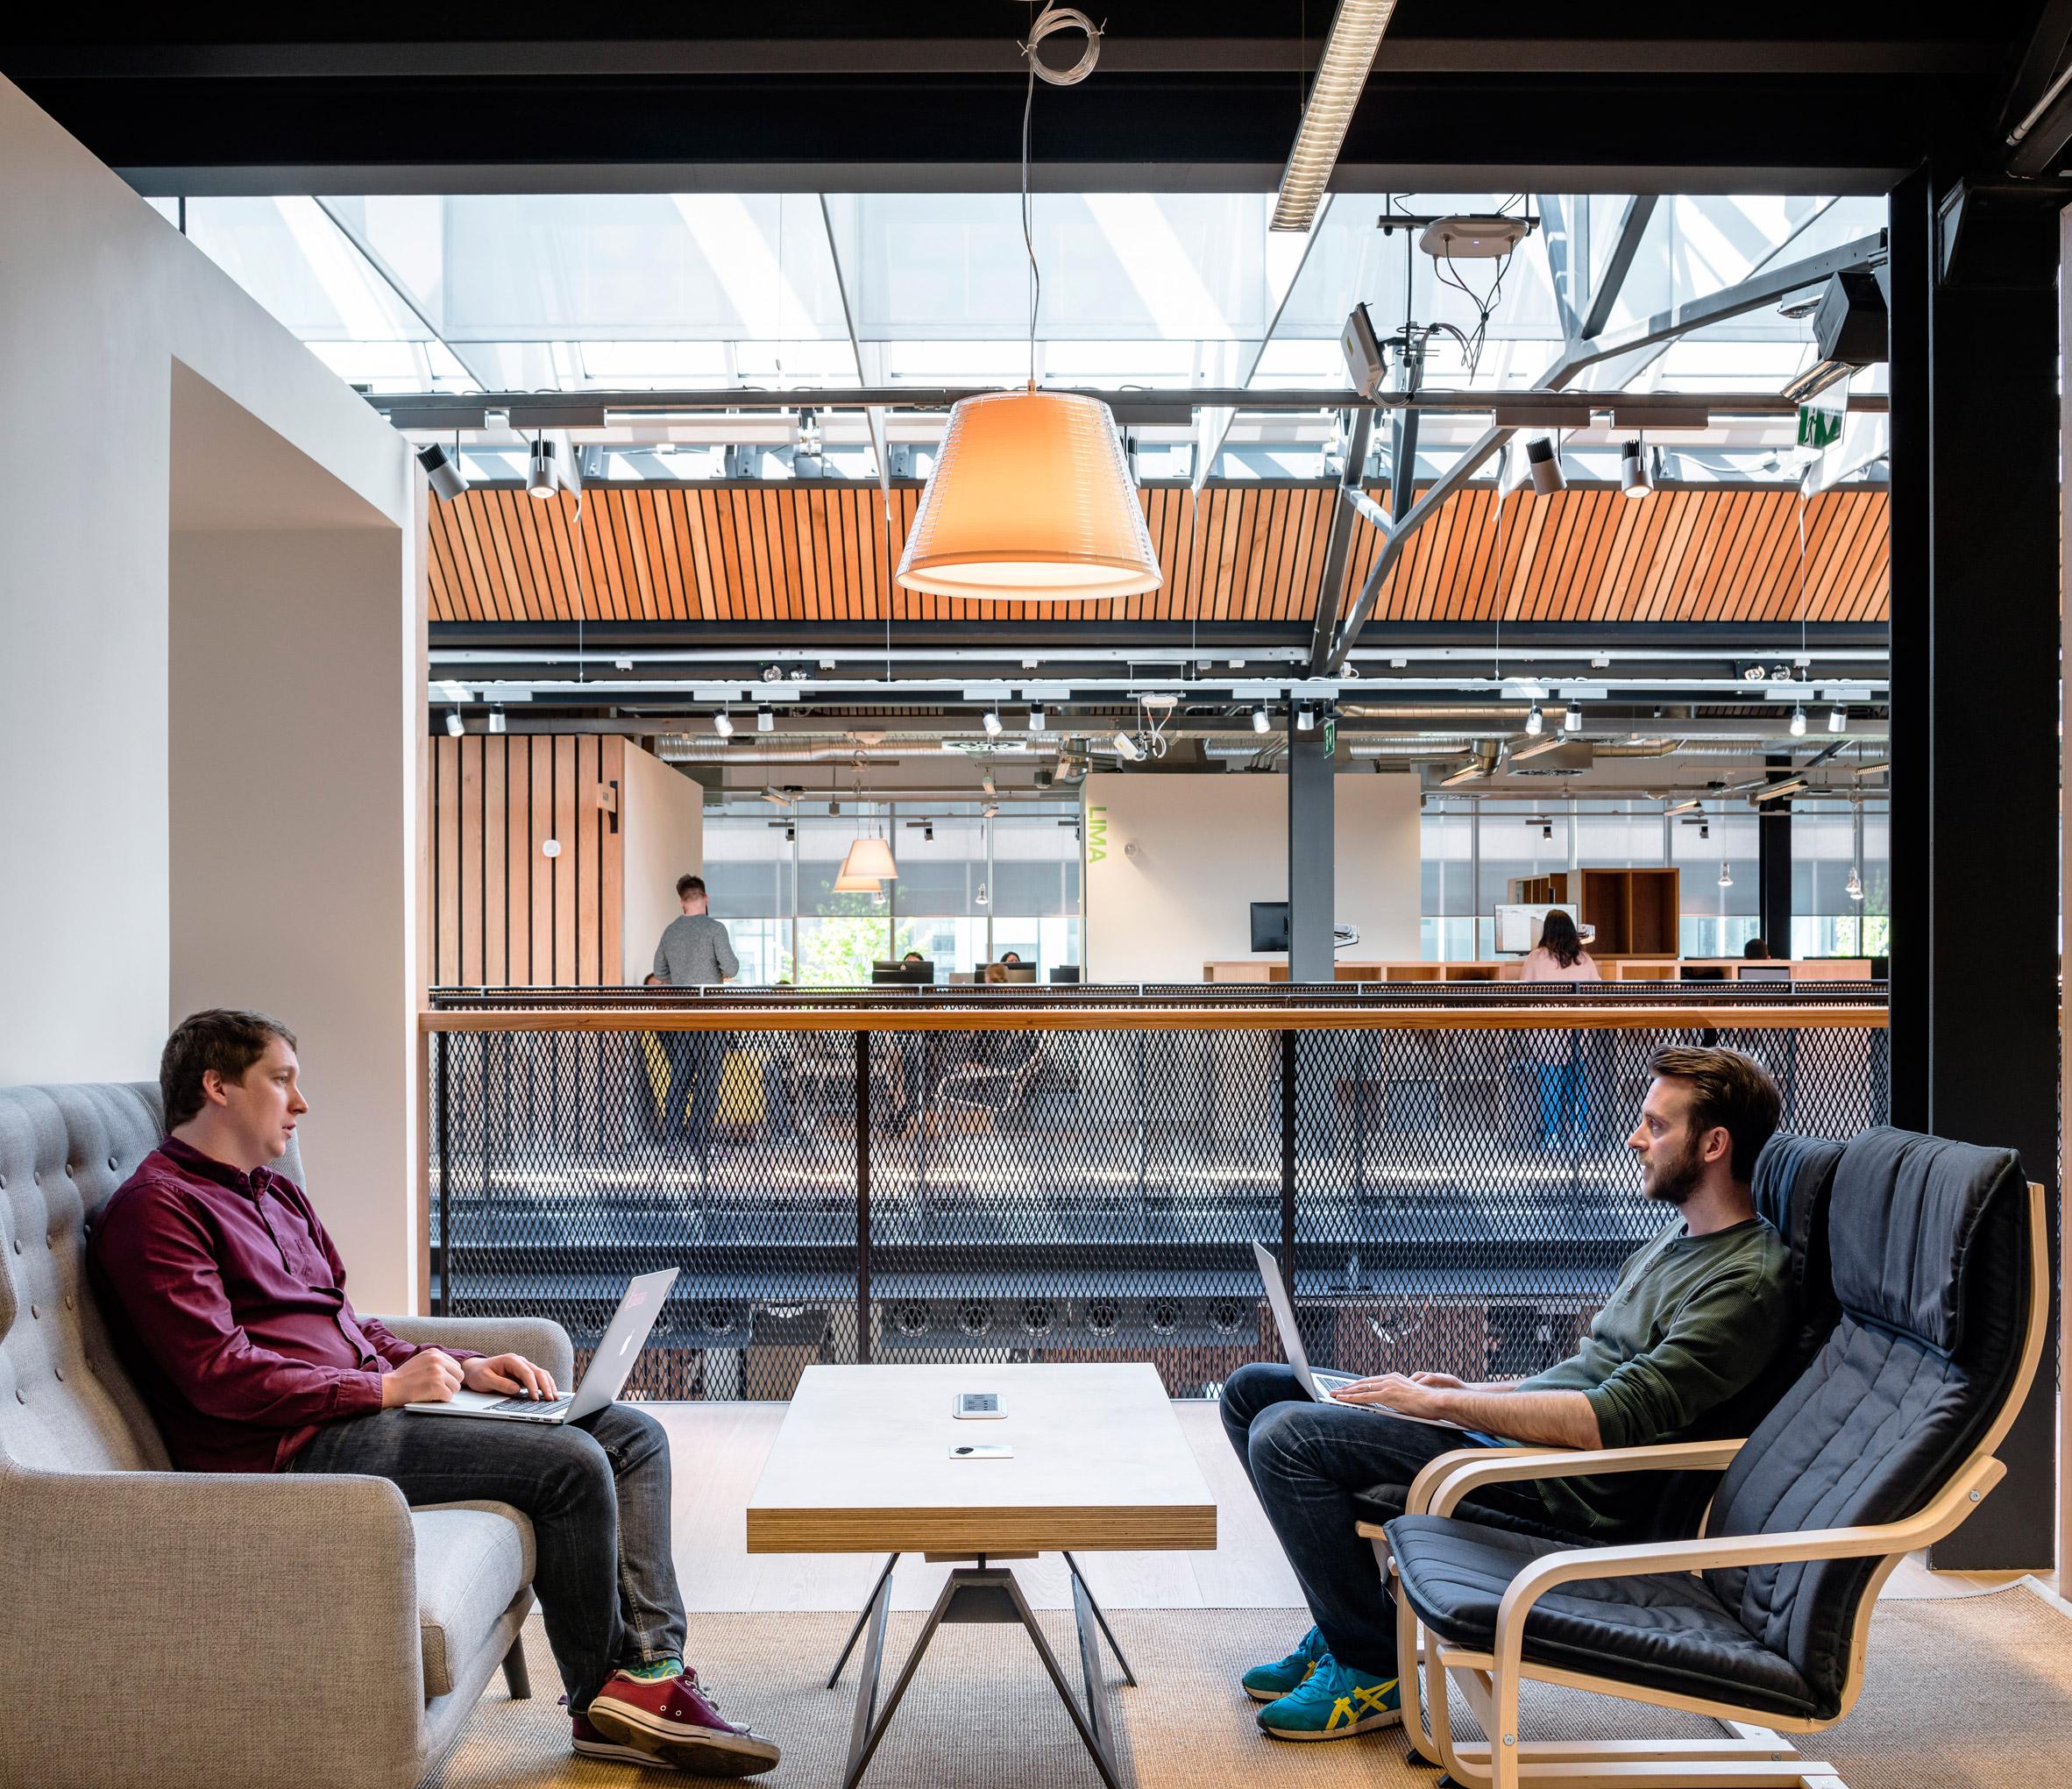 airbnb-dublin-office-interiors-ireland-offices_dezeen_2364_col_7